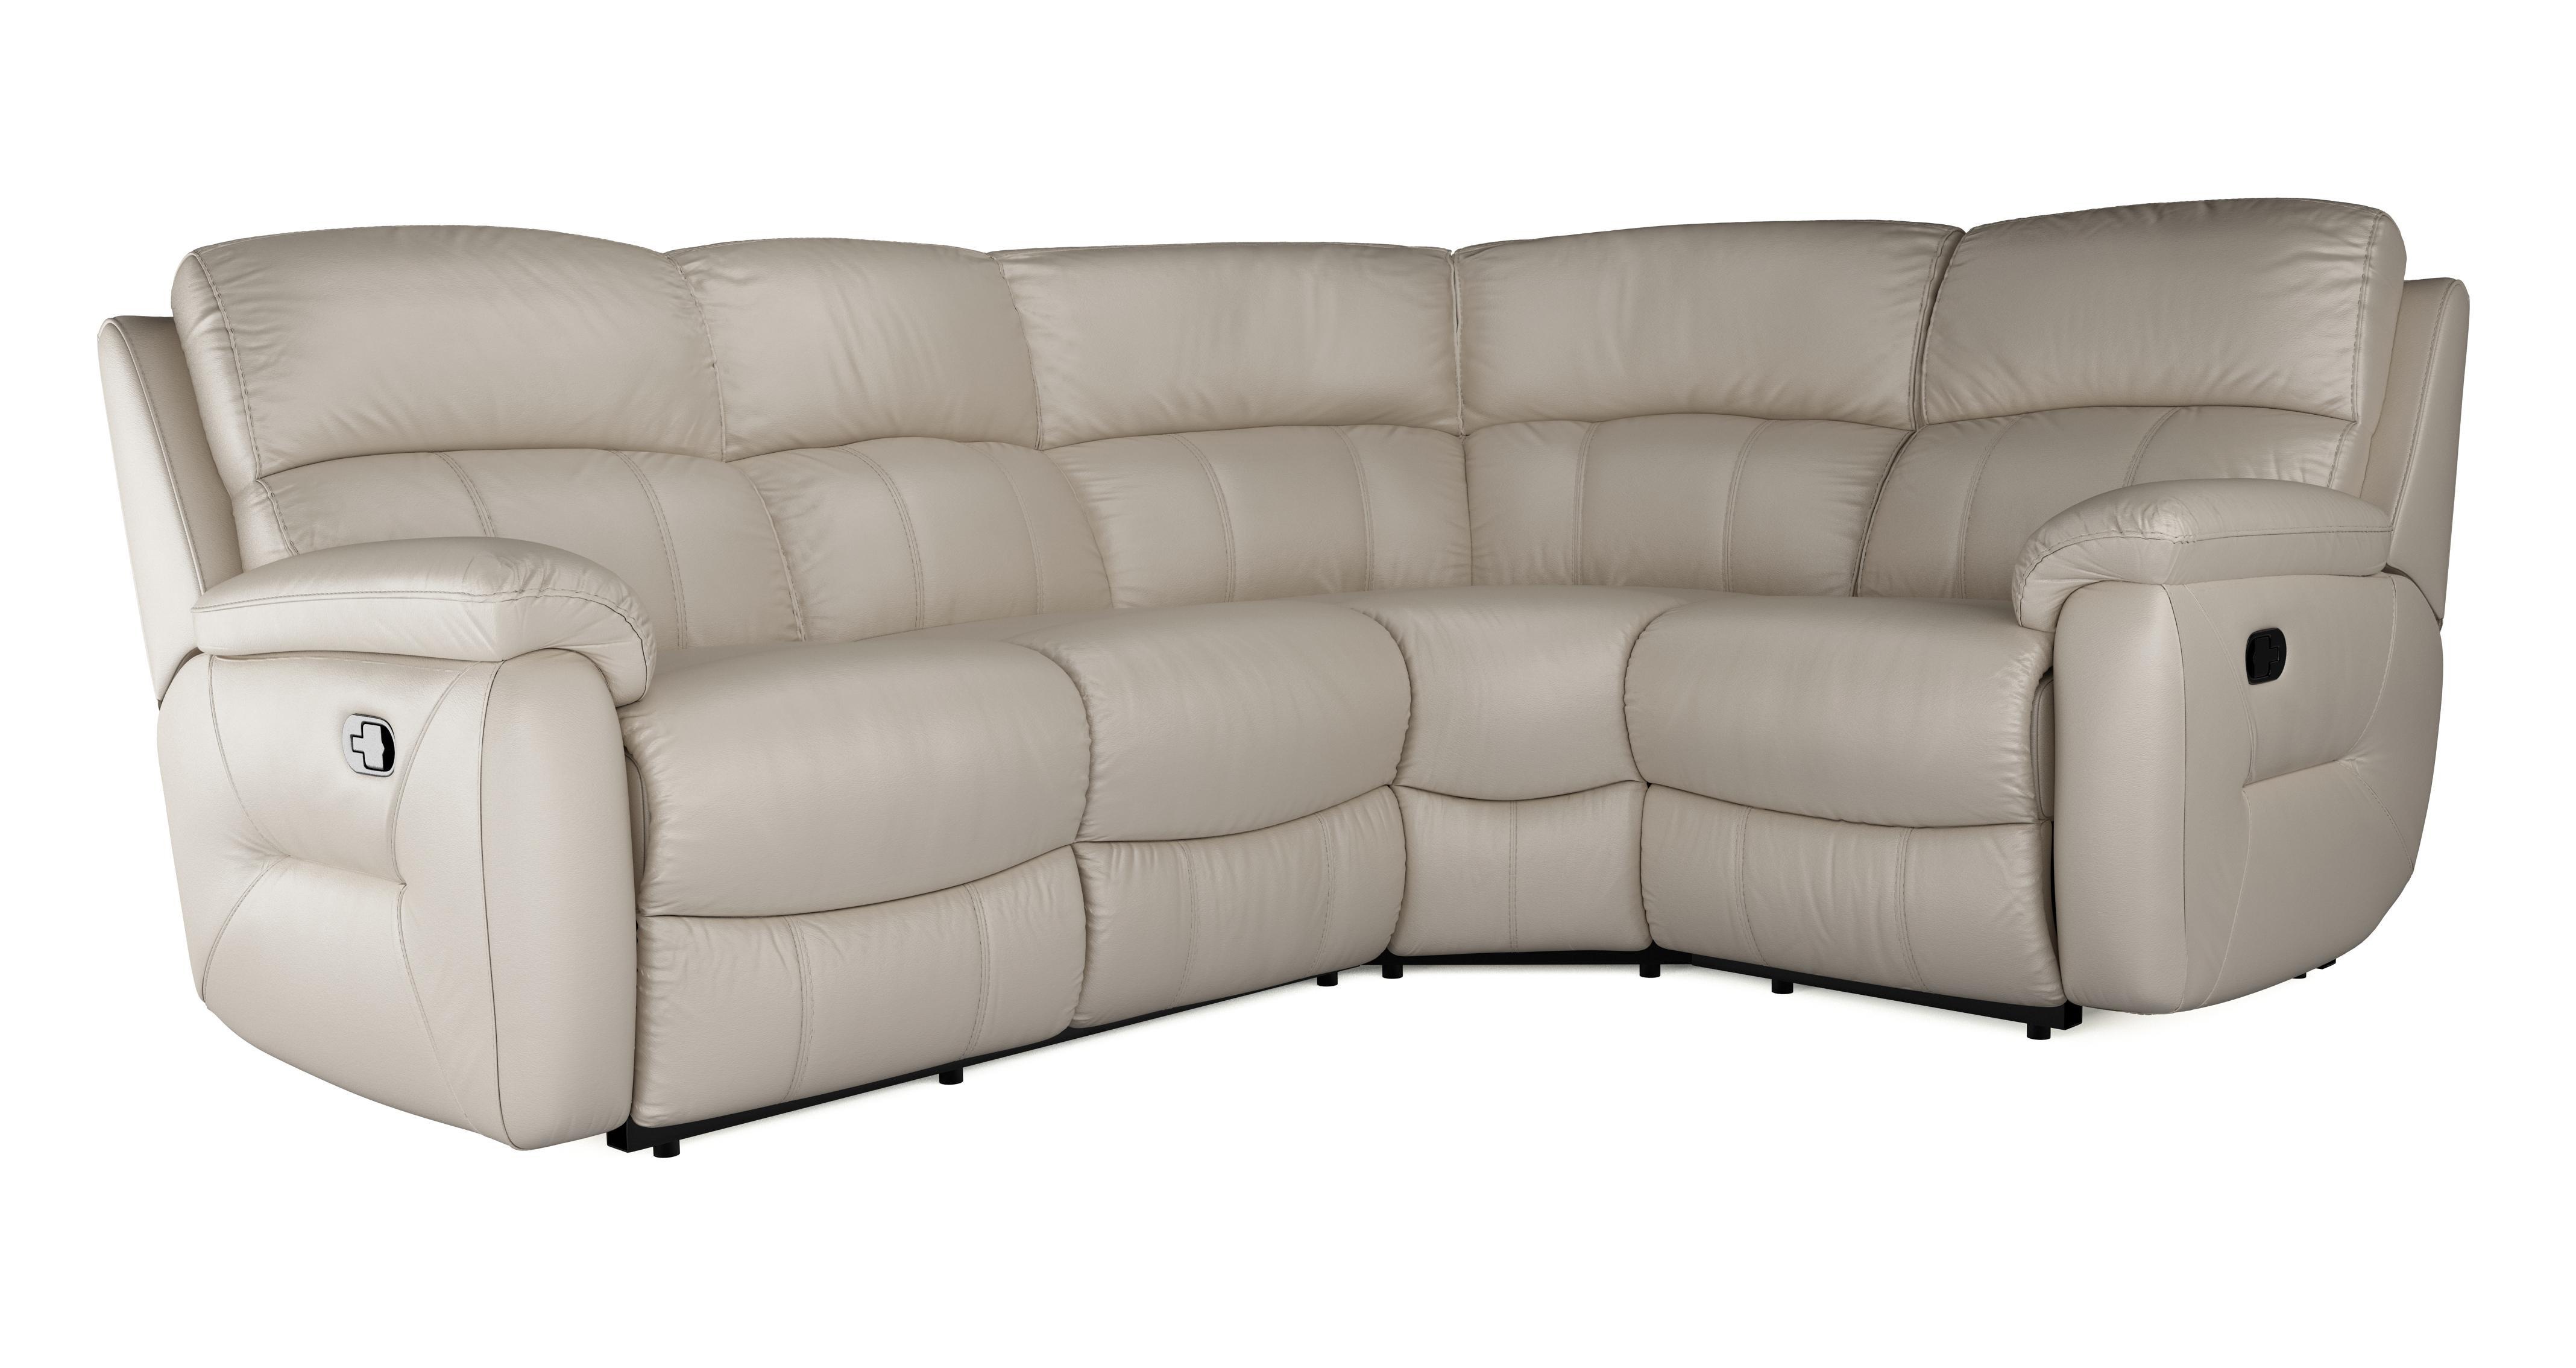 dfs navona sofa reviews black and grey corner bed option a left hand facing 2 43c 431 manual peru